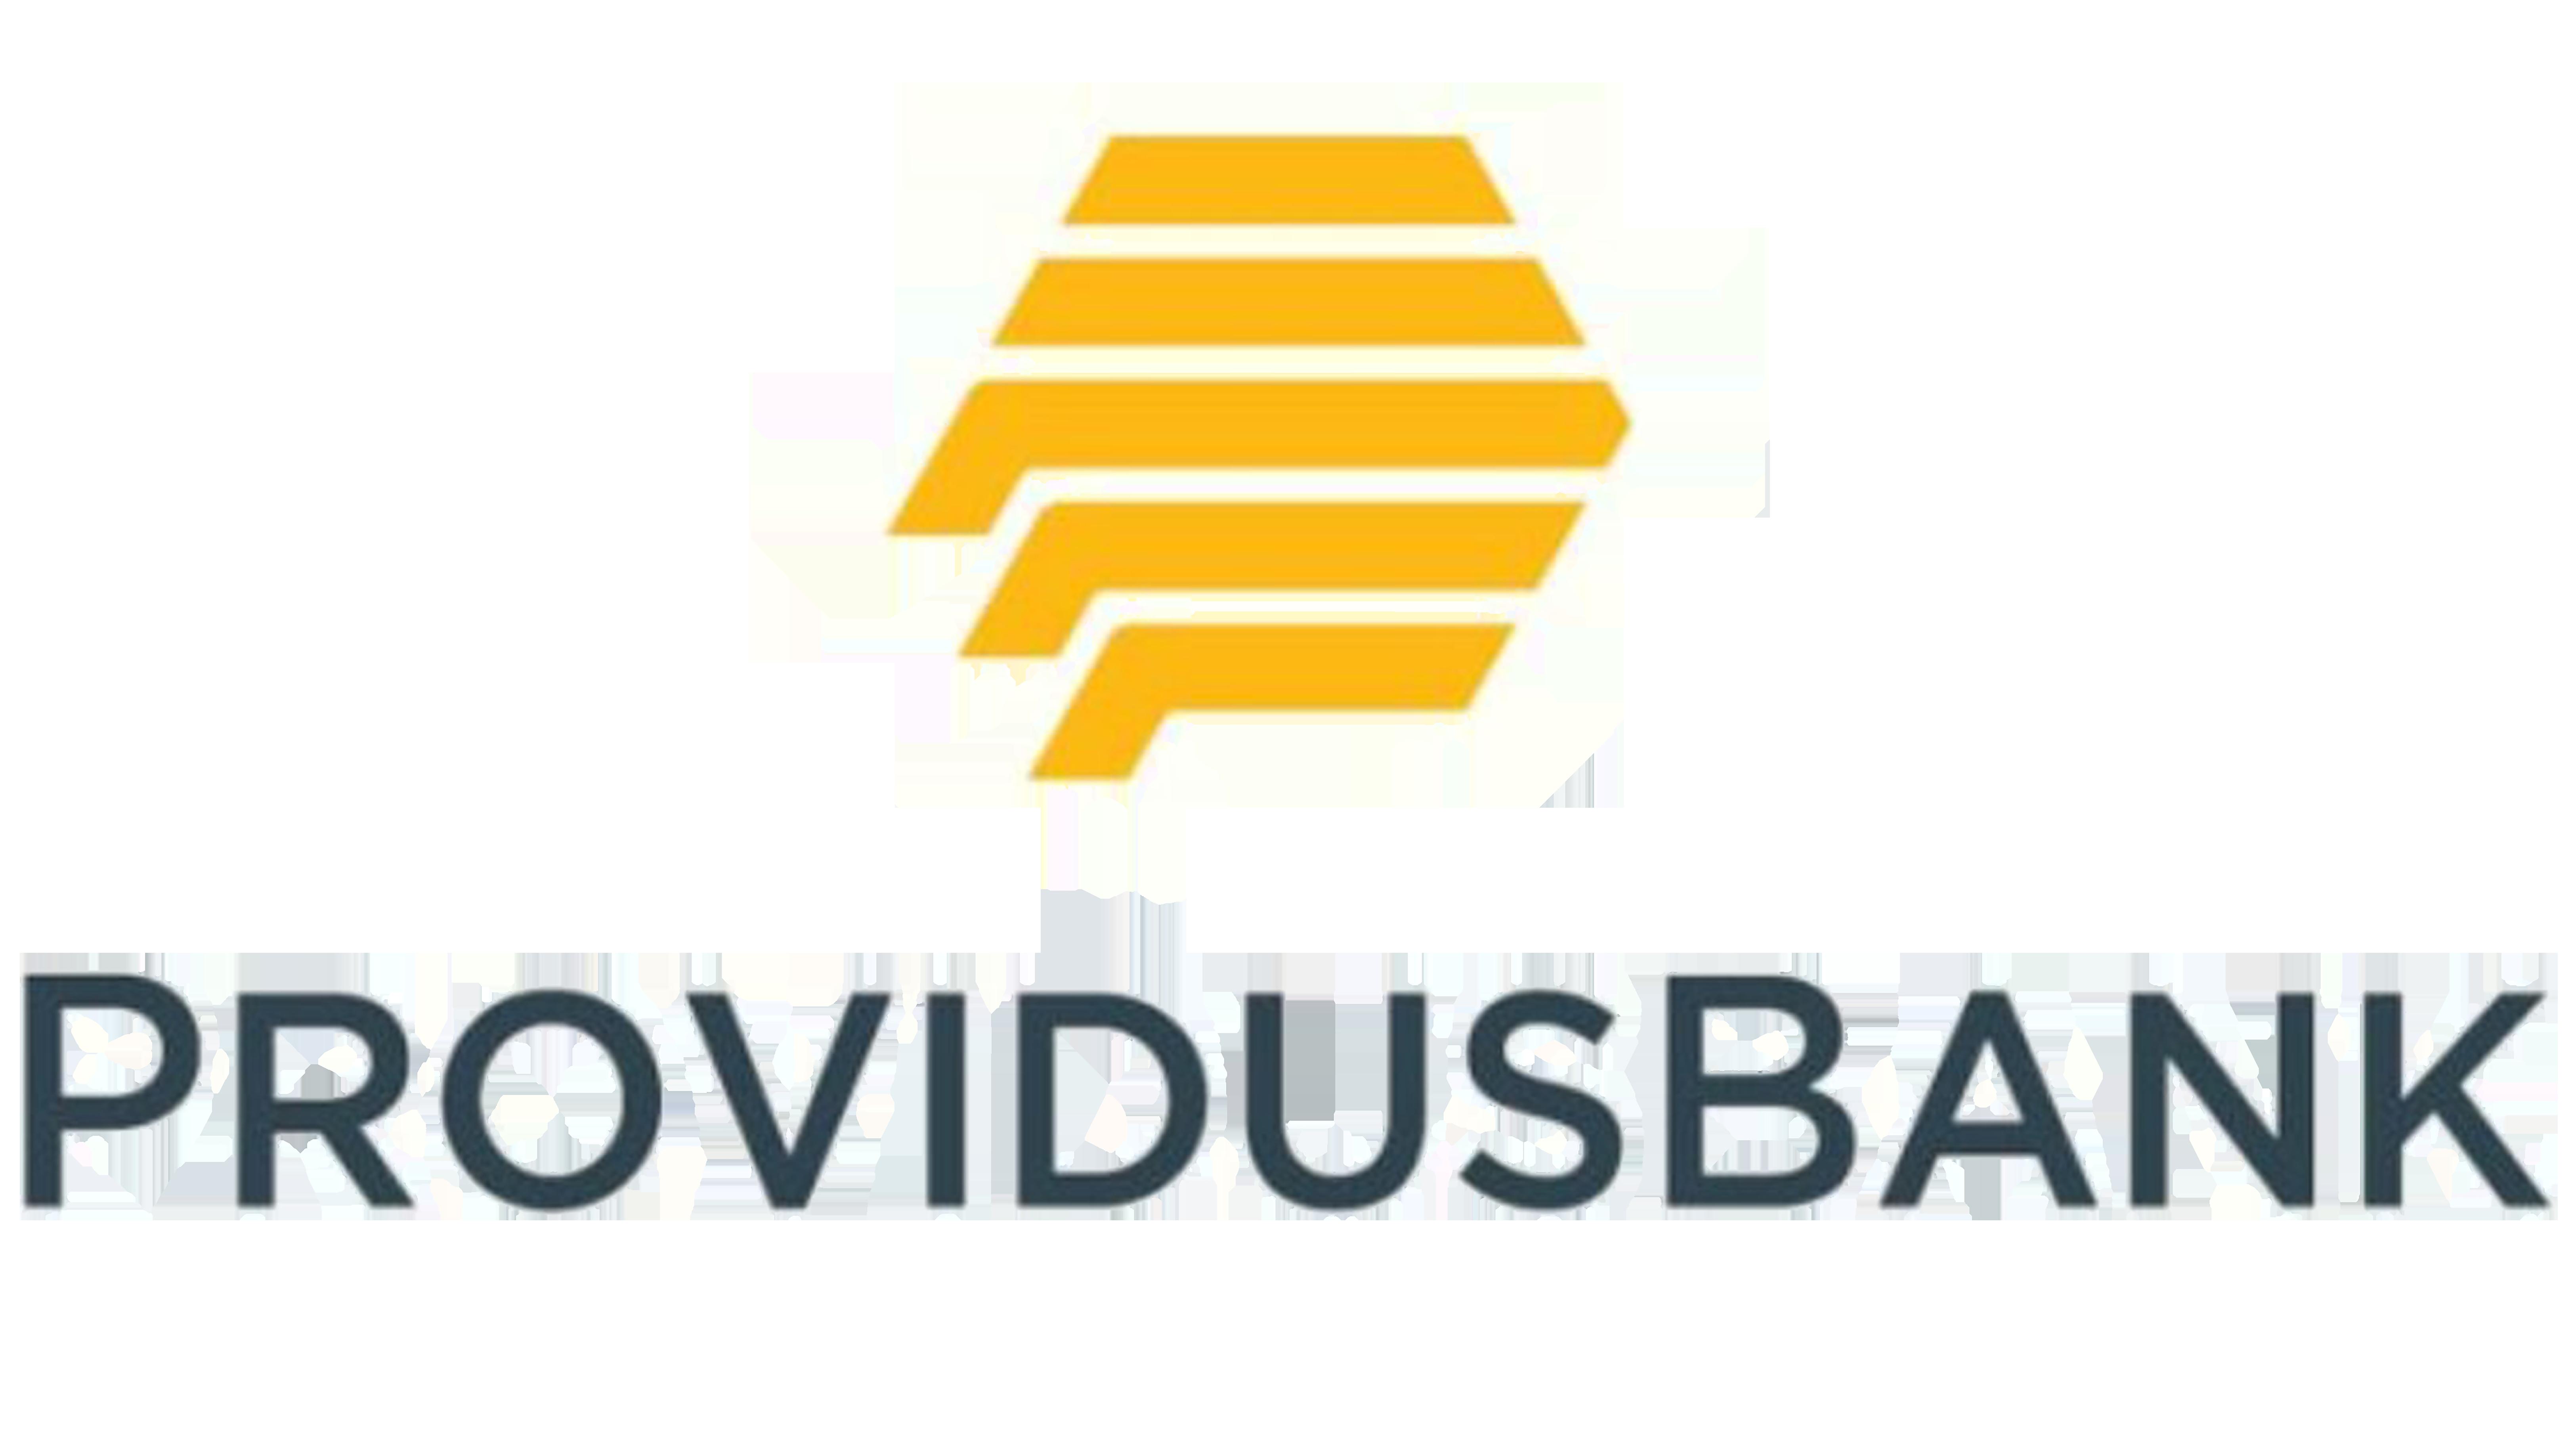 Providus Bank